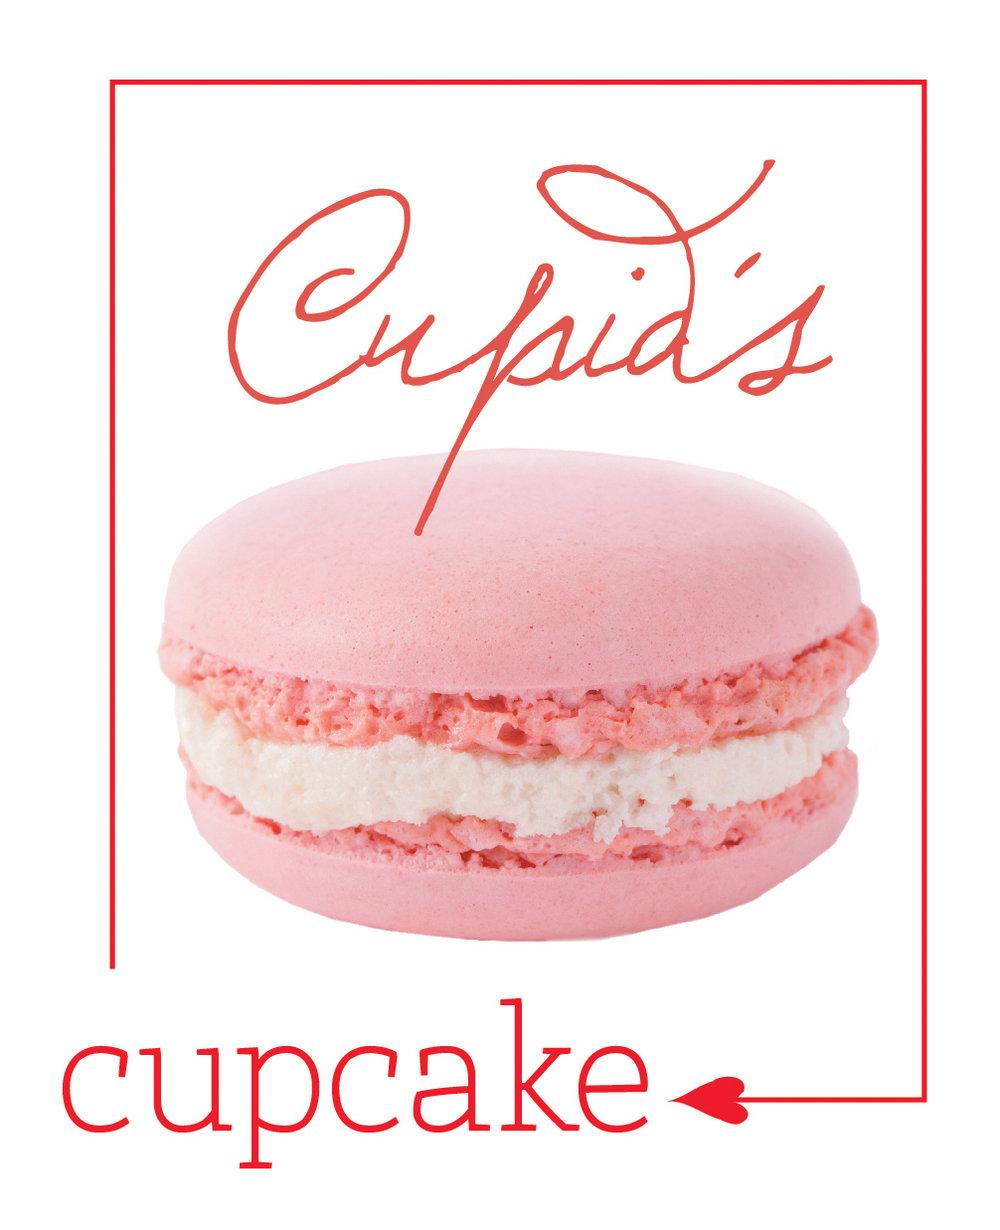 cupids-cupcake-logo.jpg